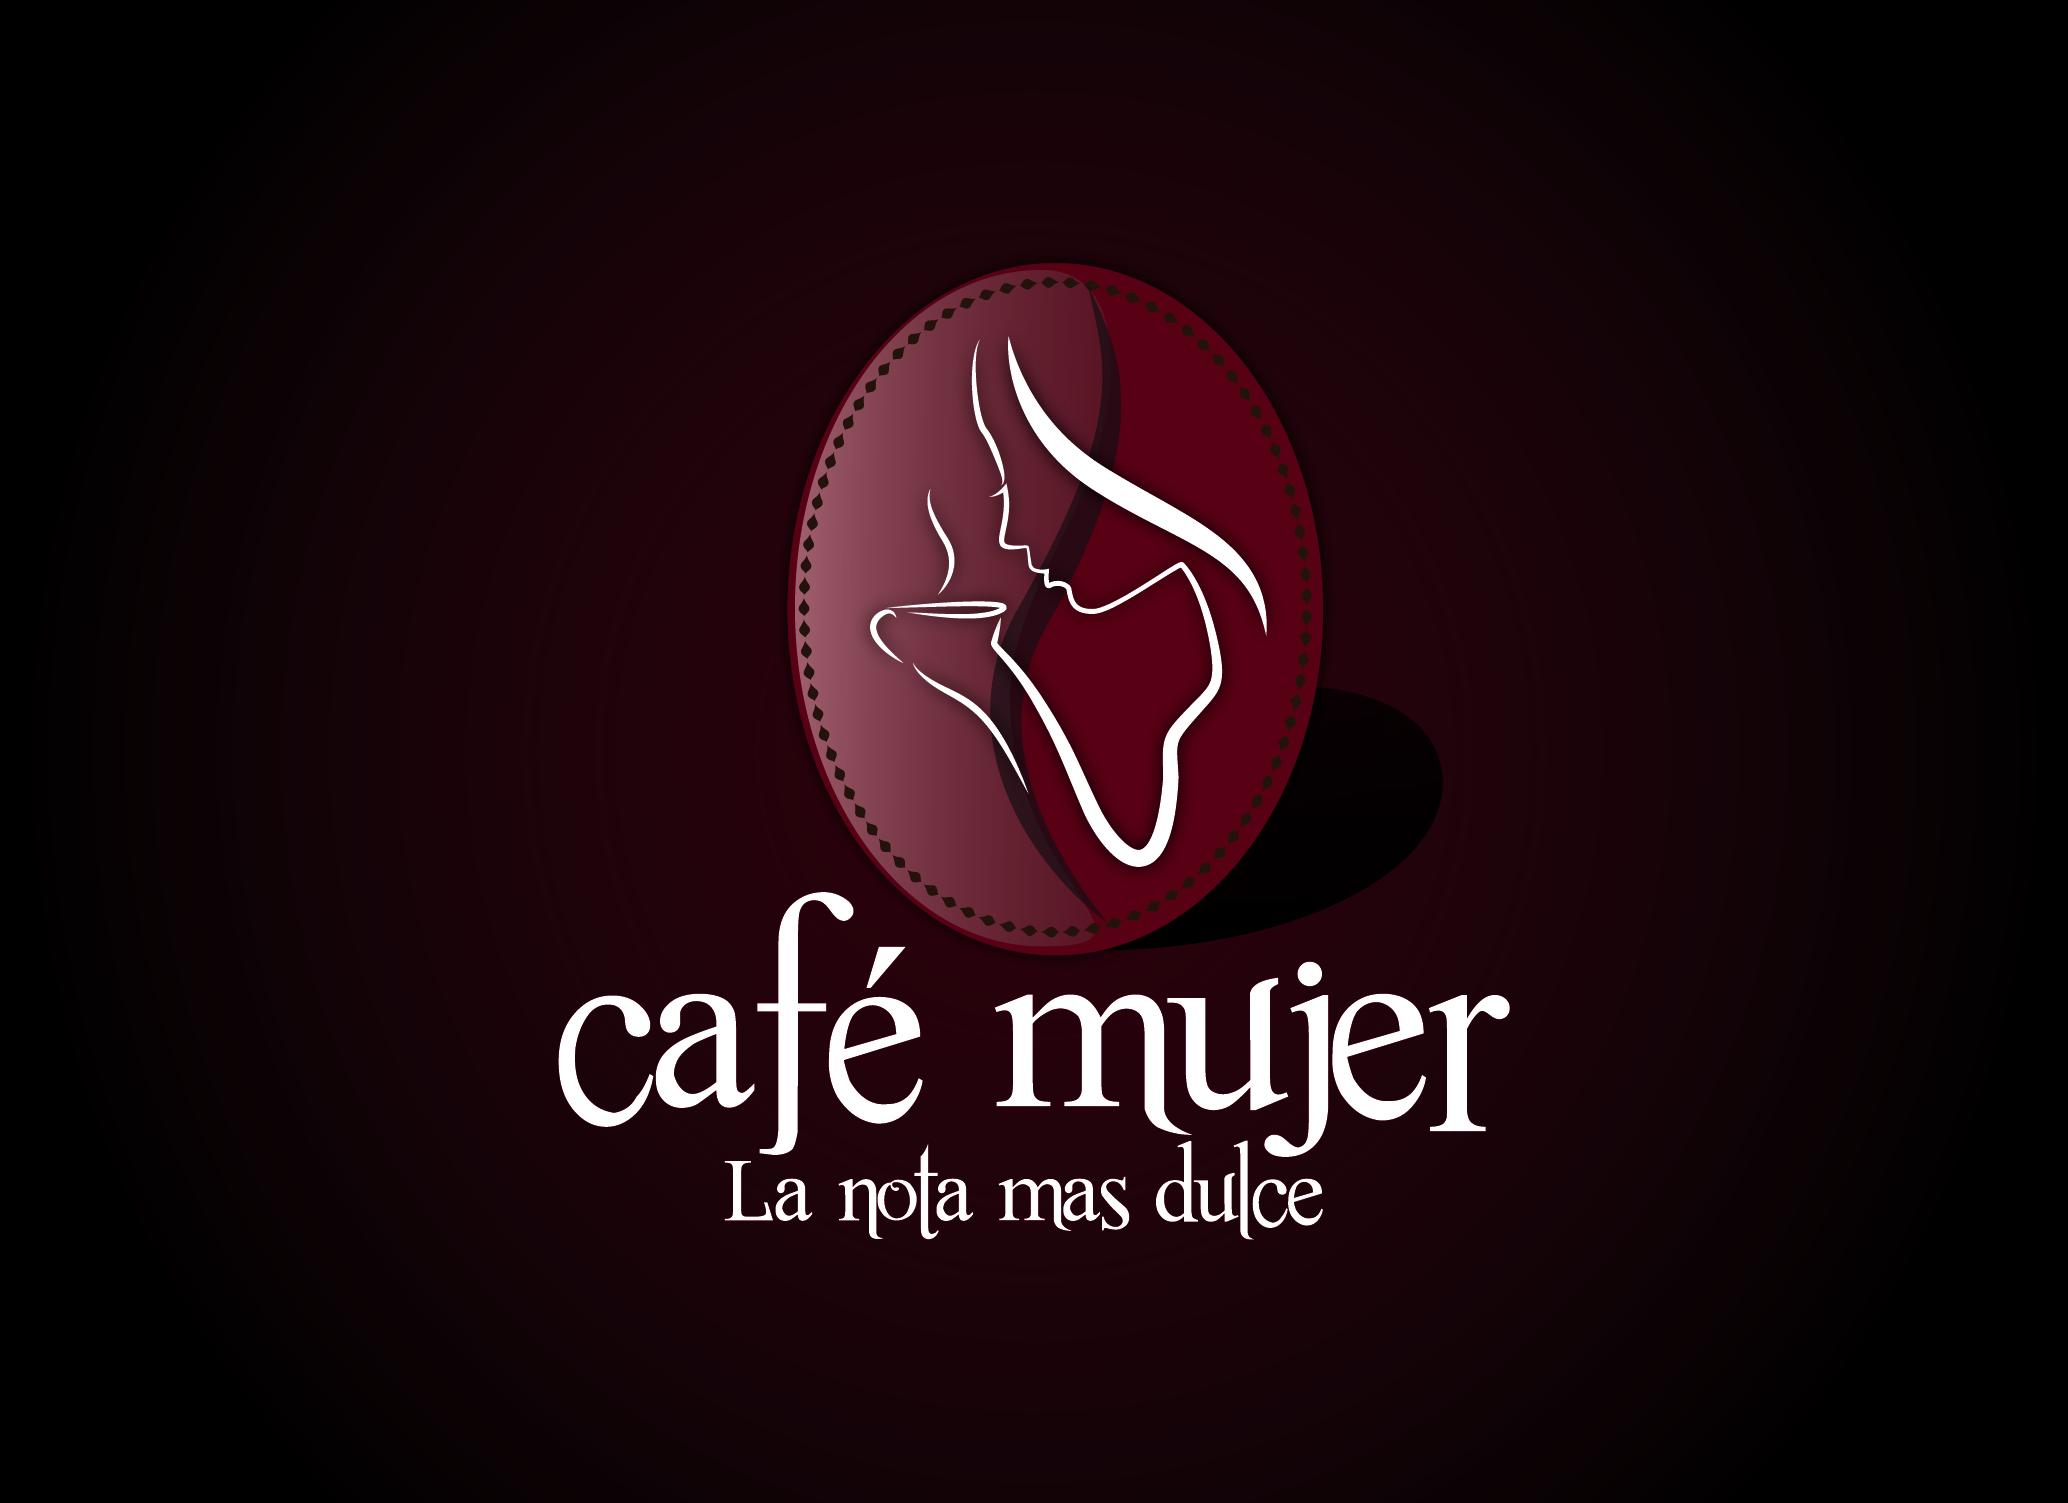 ASOCIACION DE MUJERES CAFETERAS DE CORDOBA